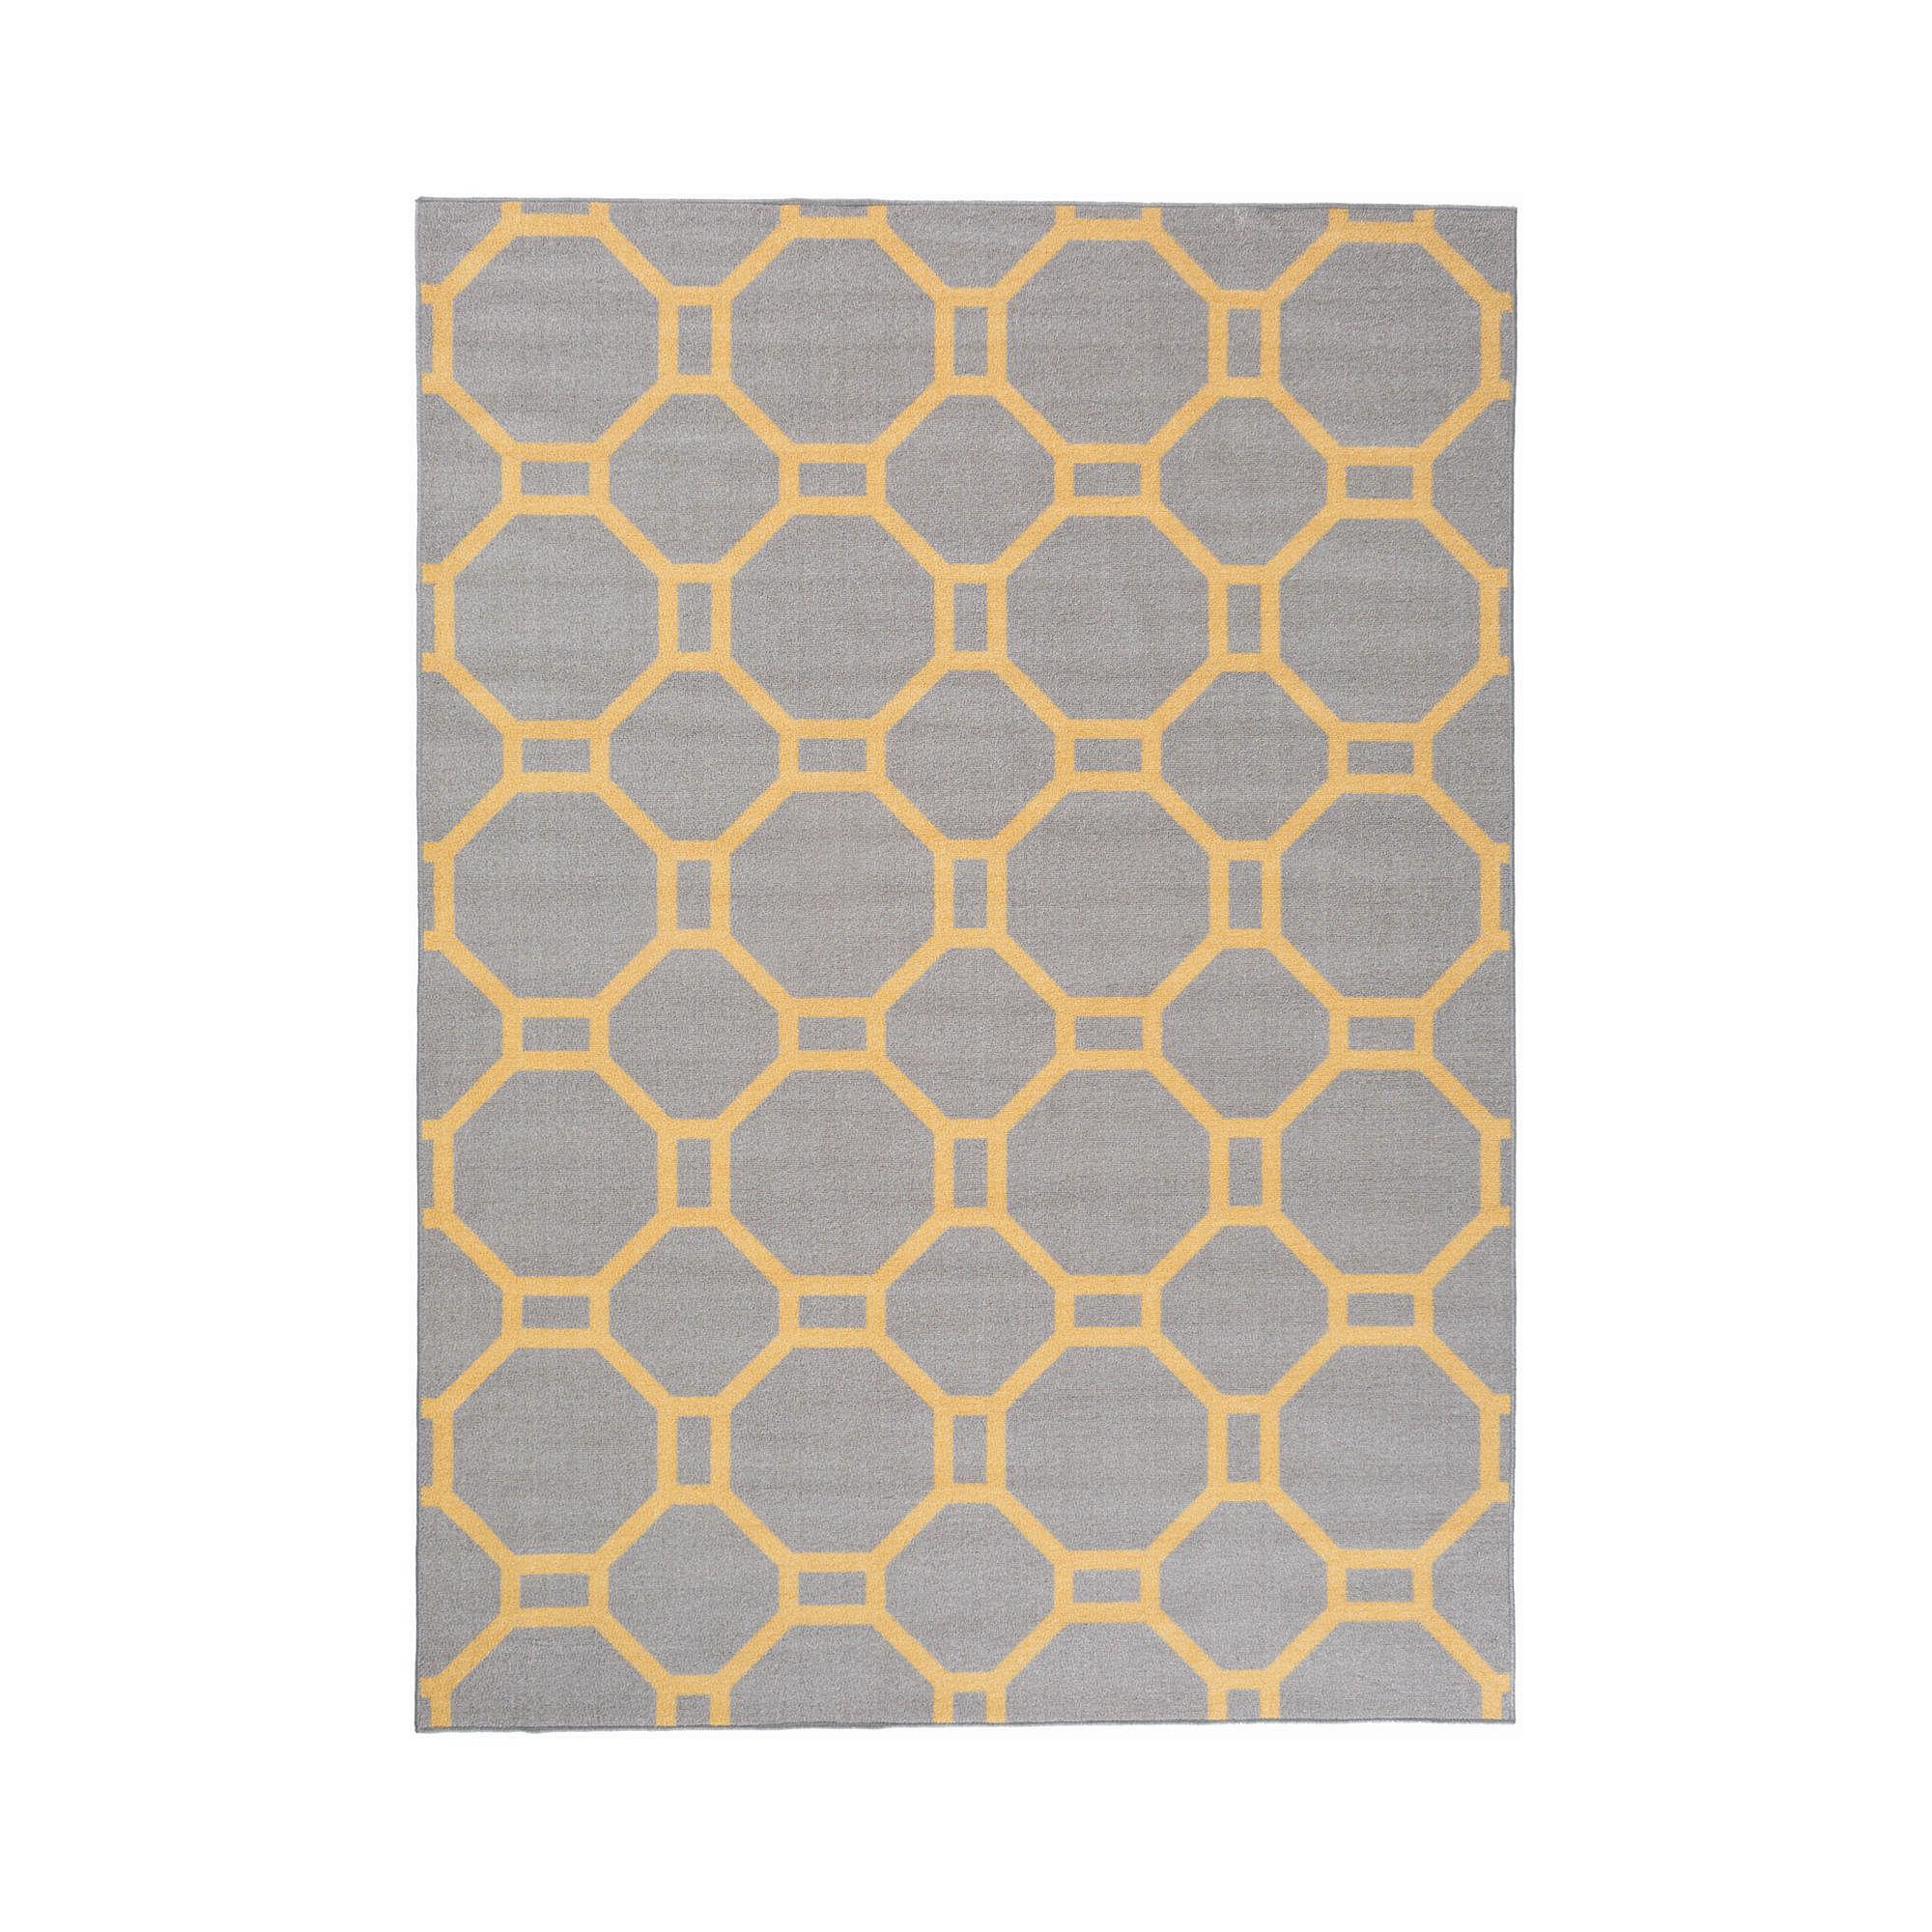 World Rug Gallery Contemporary Geometric Non-Skid Rectangular Rugs